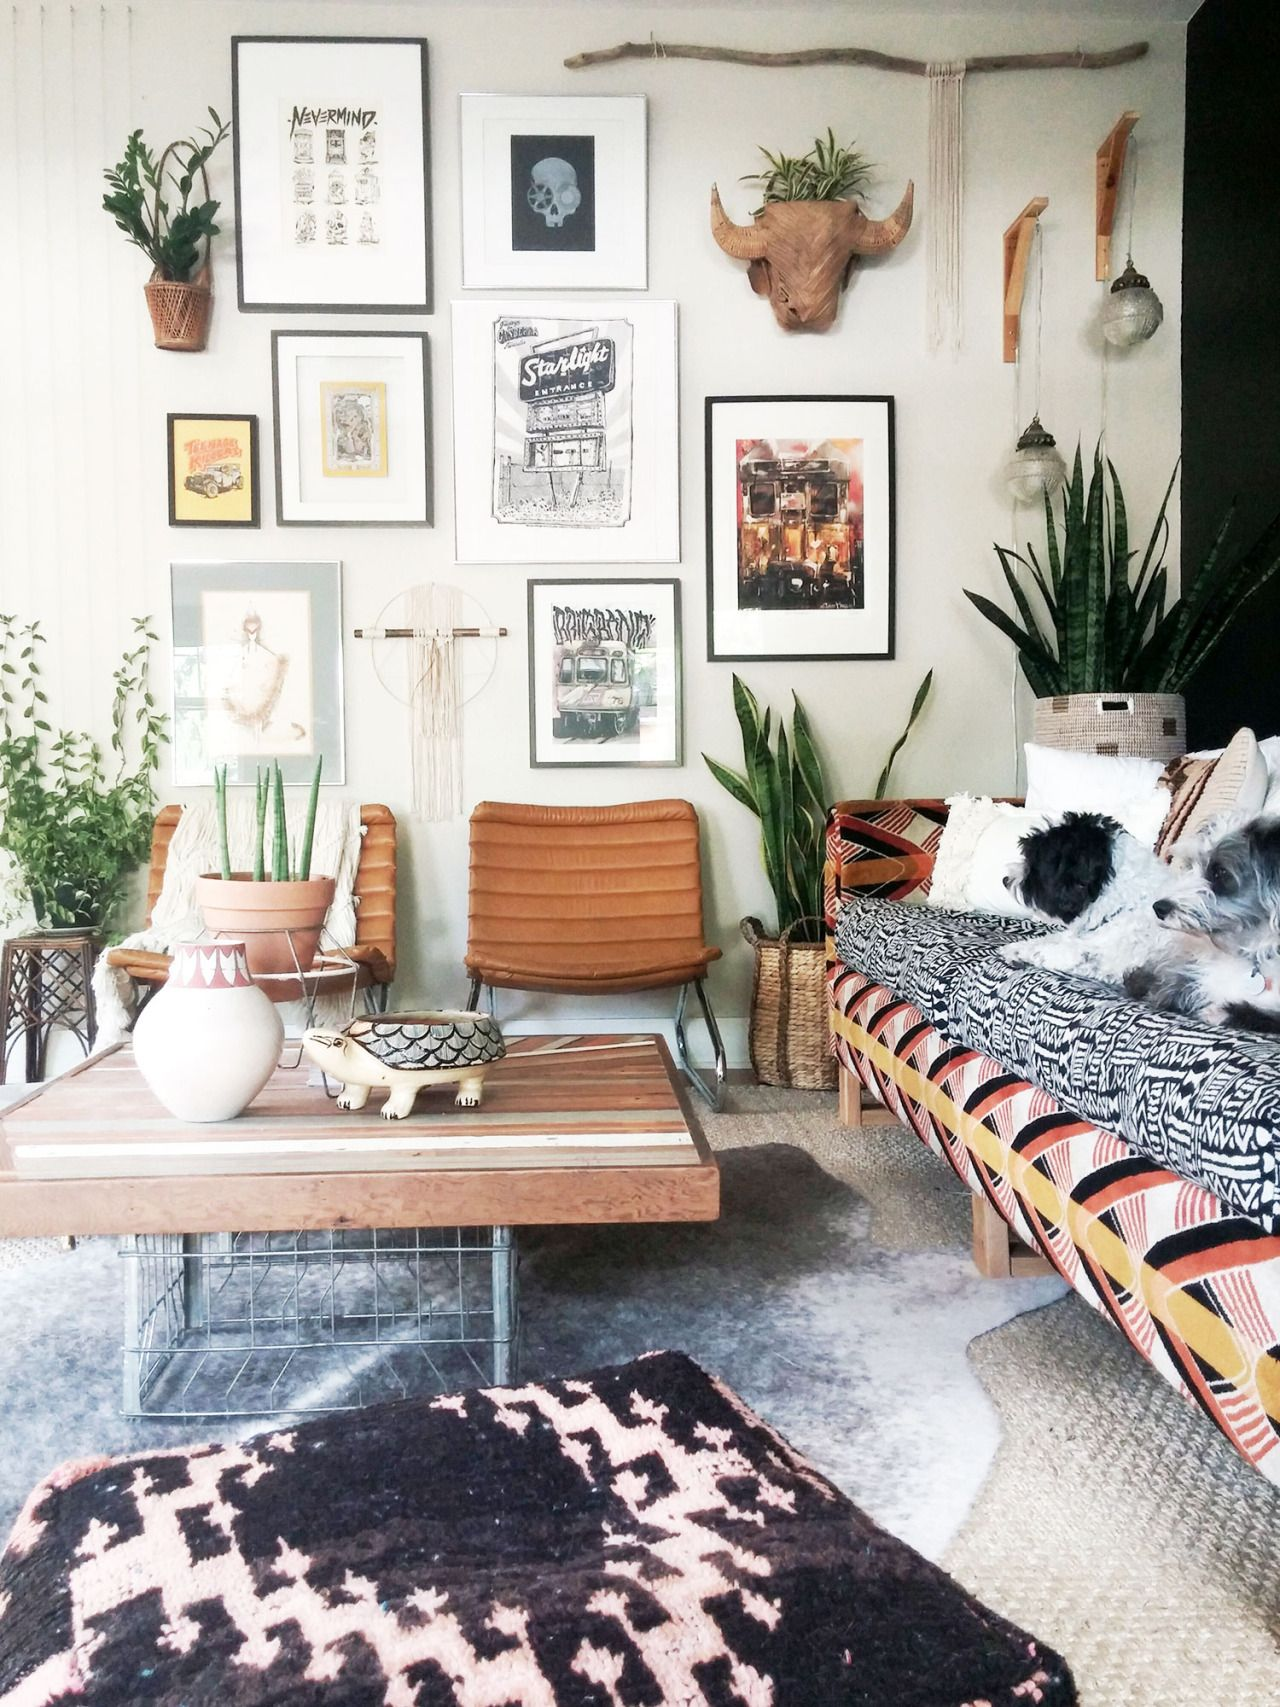 Bohemian Living Room Wall Ideas Wallpaper Uk Pin By Alia Clark On House Pinterest Designs Art Boho Decor Spaces Eclectic